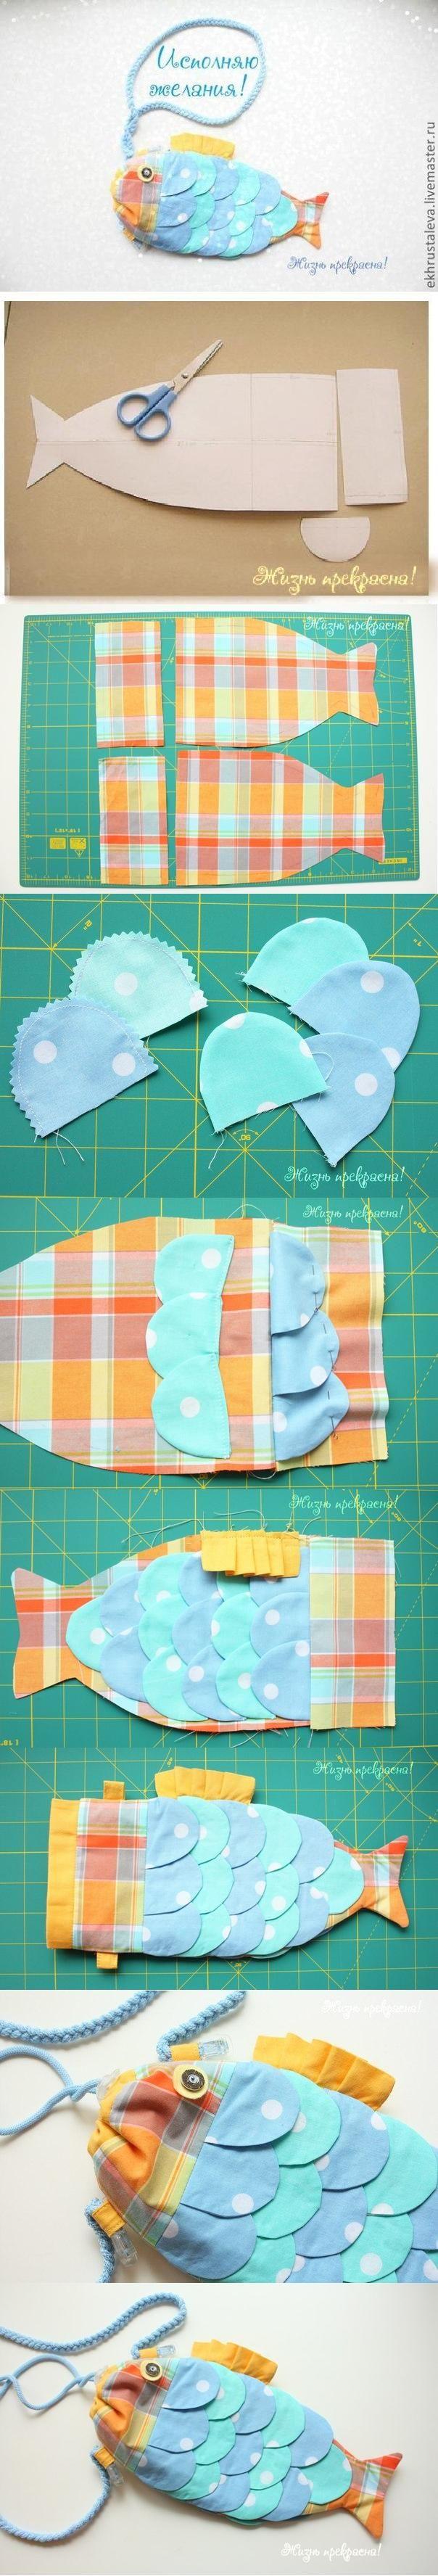 DIY Cute Fish Handbag for Kids | iCreativeIdeas.com Like Us on Facebook ==> https://www.facebook.com/icreativeideas